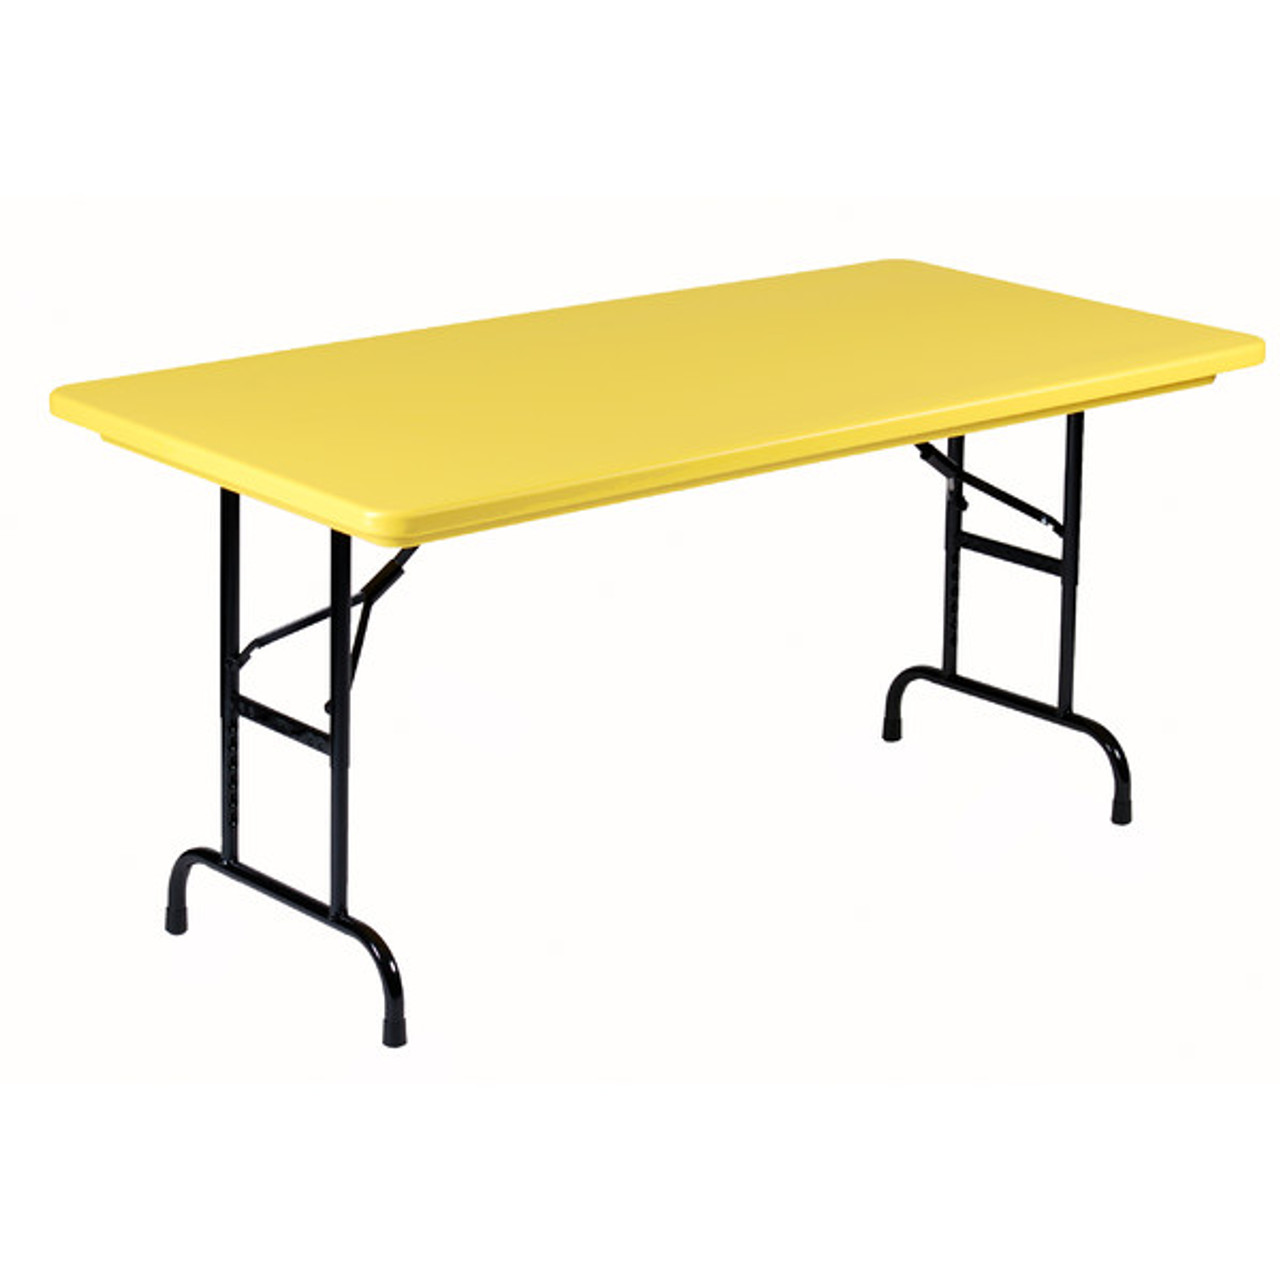 30 X 60 Folding Table.Correll Ra3060 28 Heavy Duty Plastic Folding Table Yellow 30 W X 60 L Adjustable Height